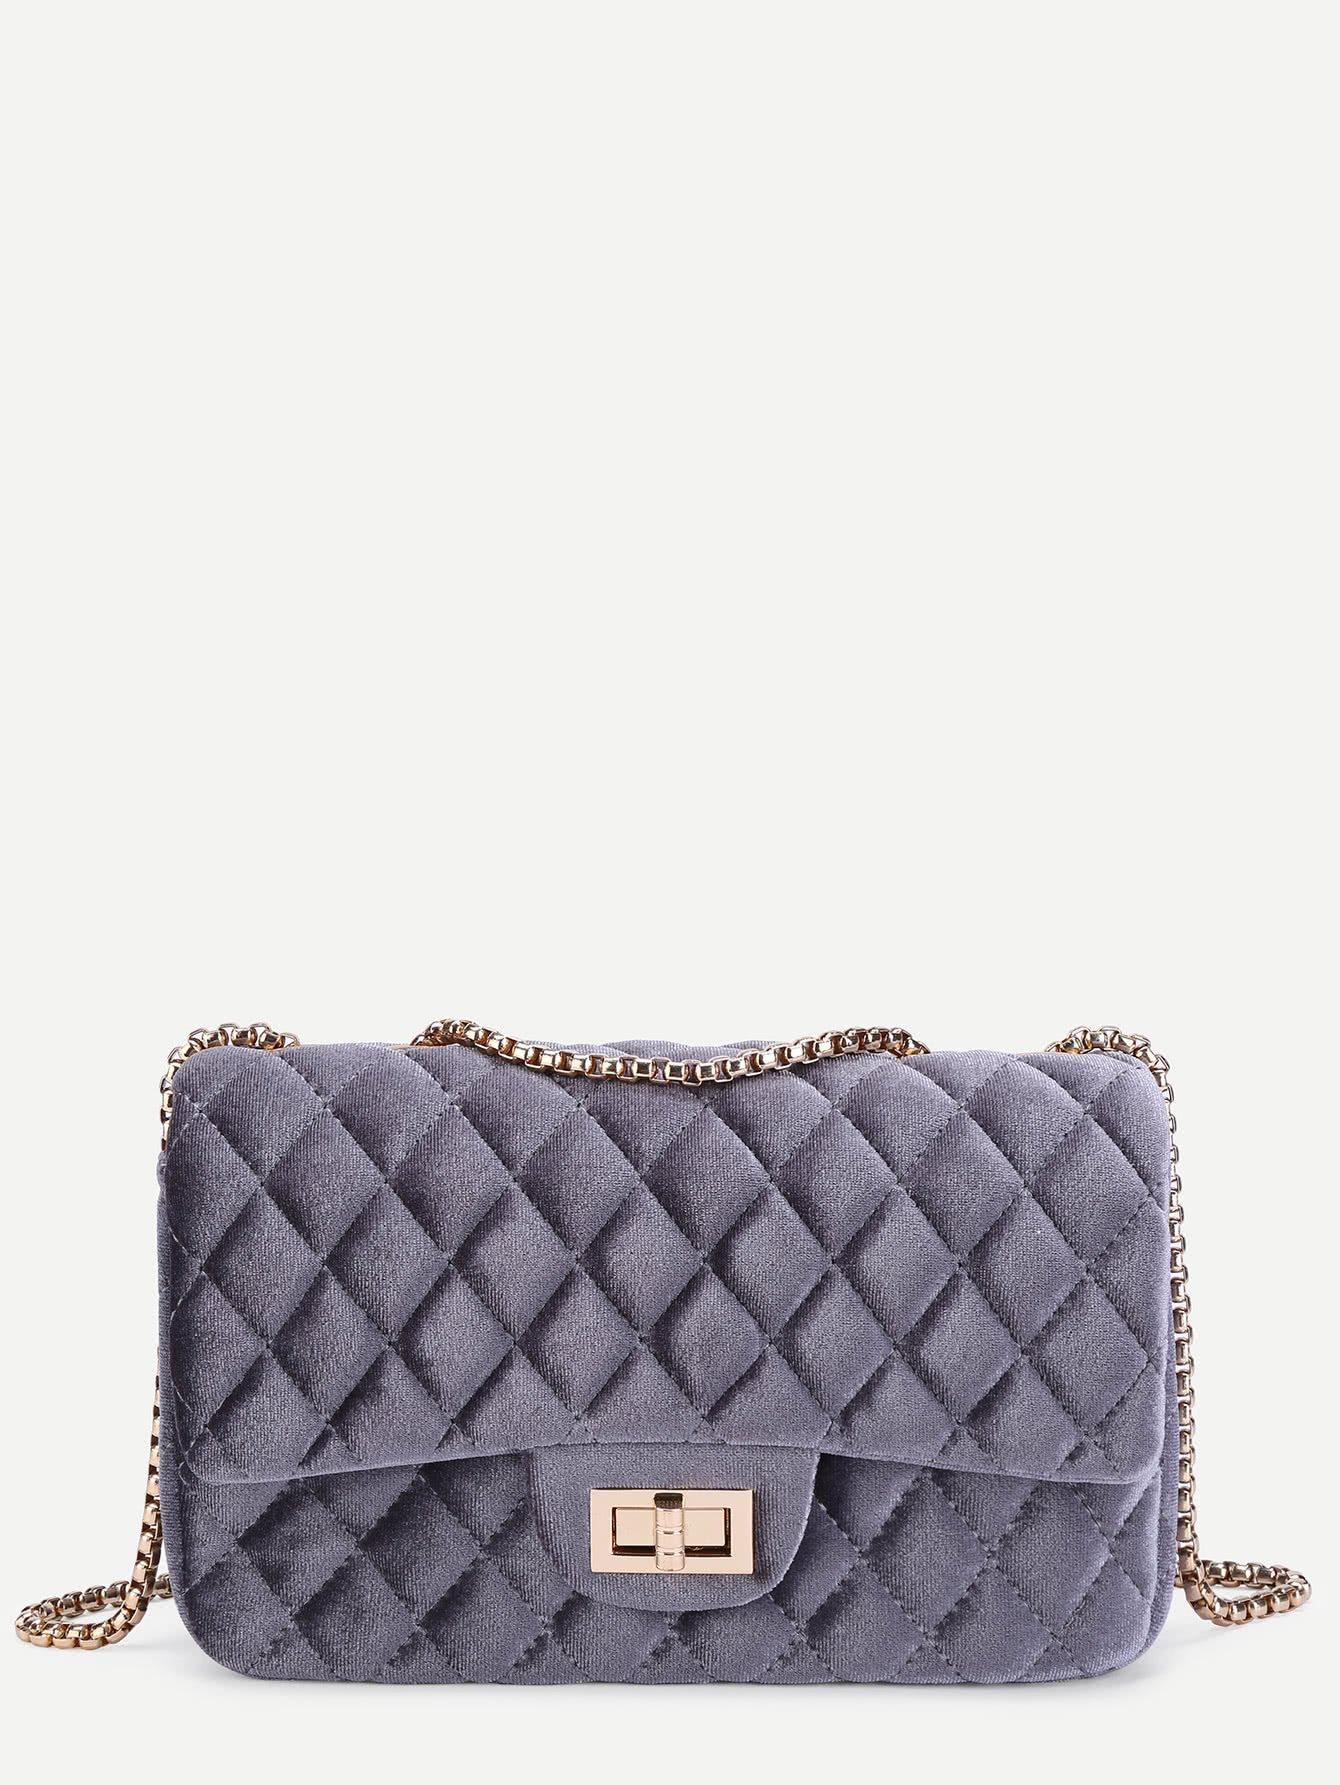 Twist Lock Quilted Velvet Chain Bag